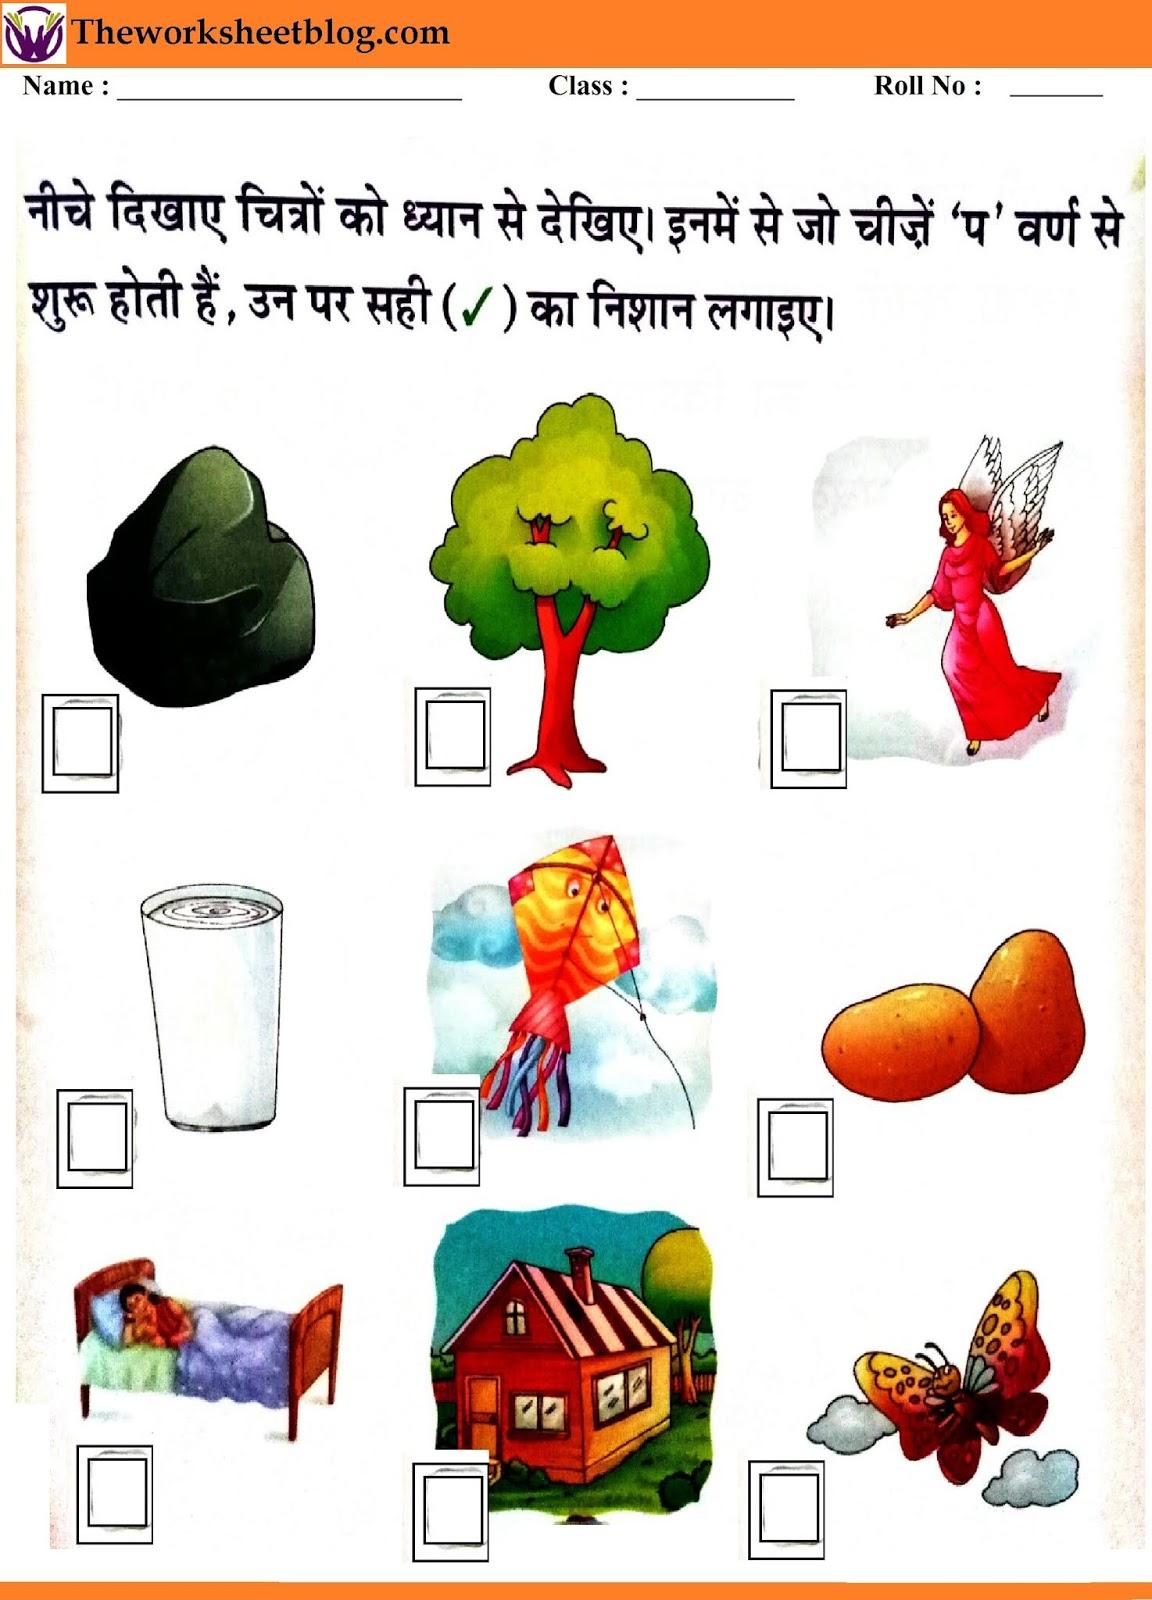 Worksheet Of Hindi Class 1st